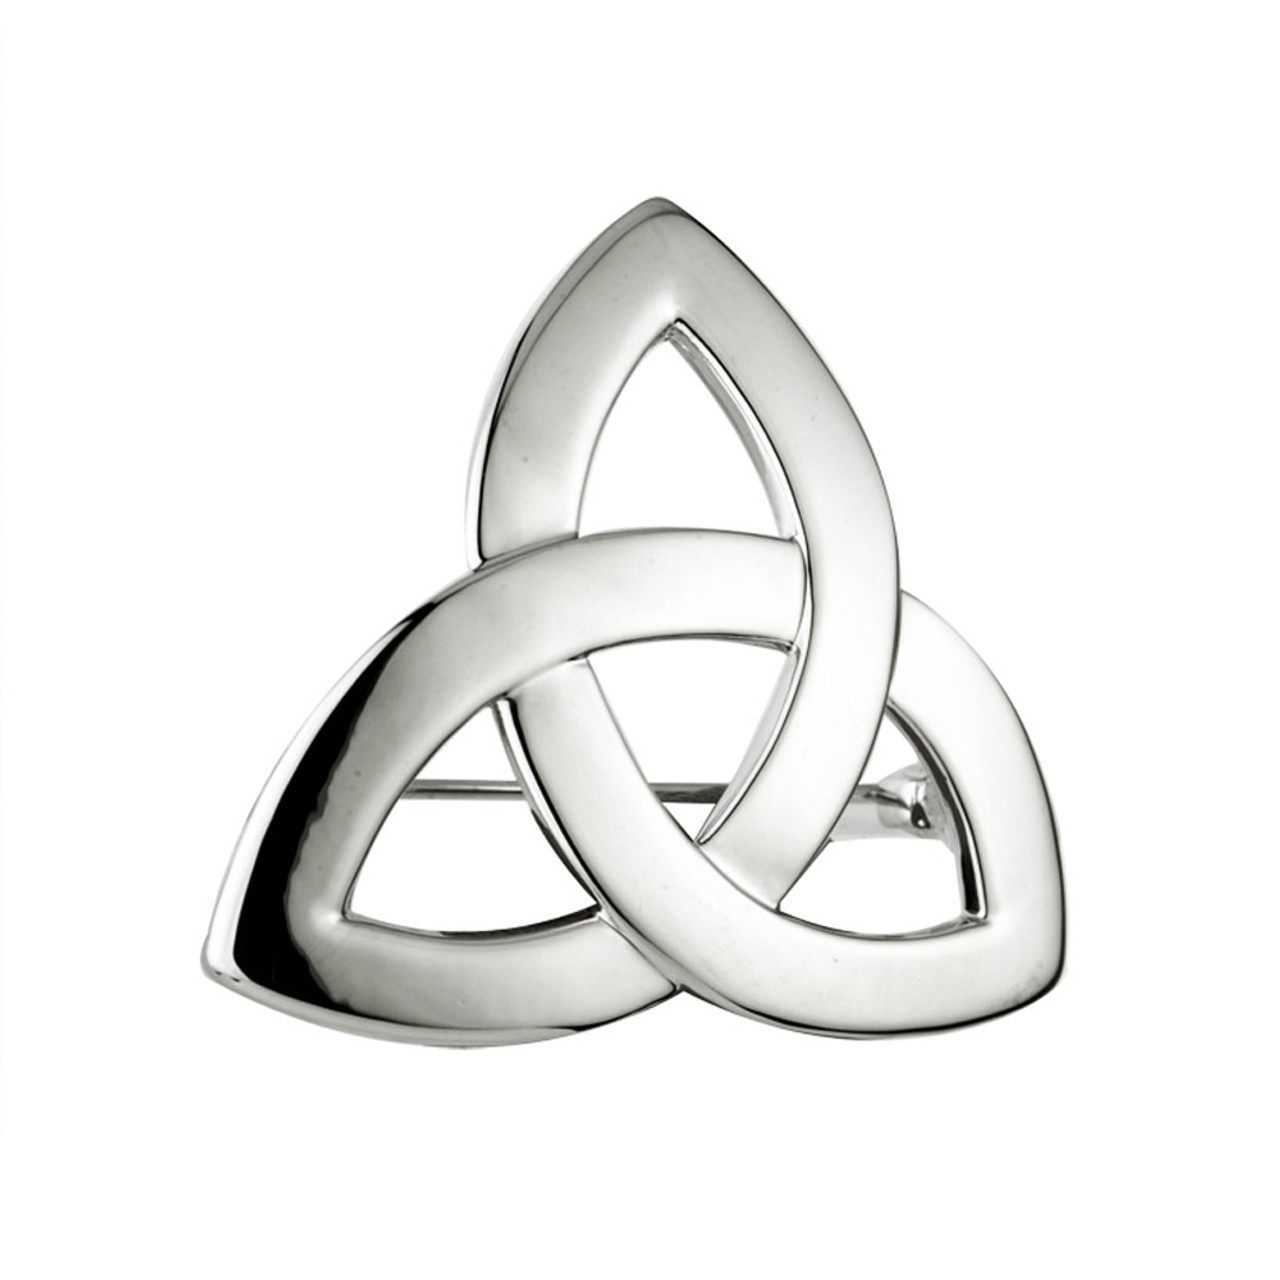 Rhodium Plated Trinity Knot Brooch